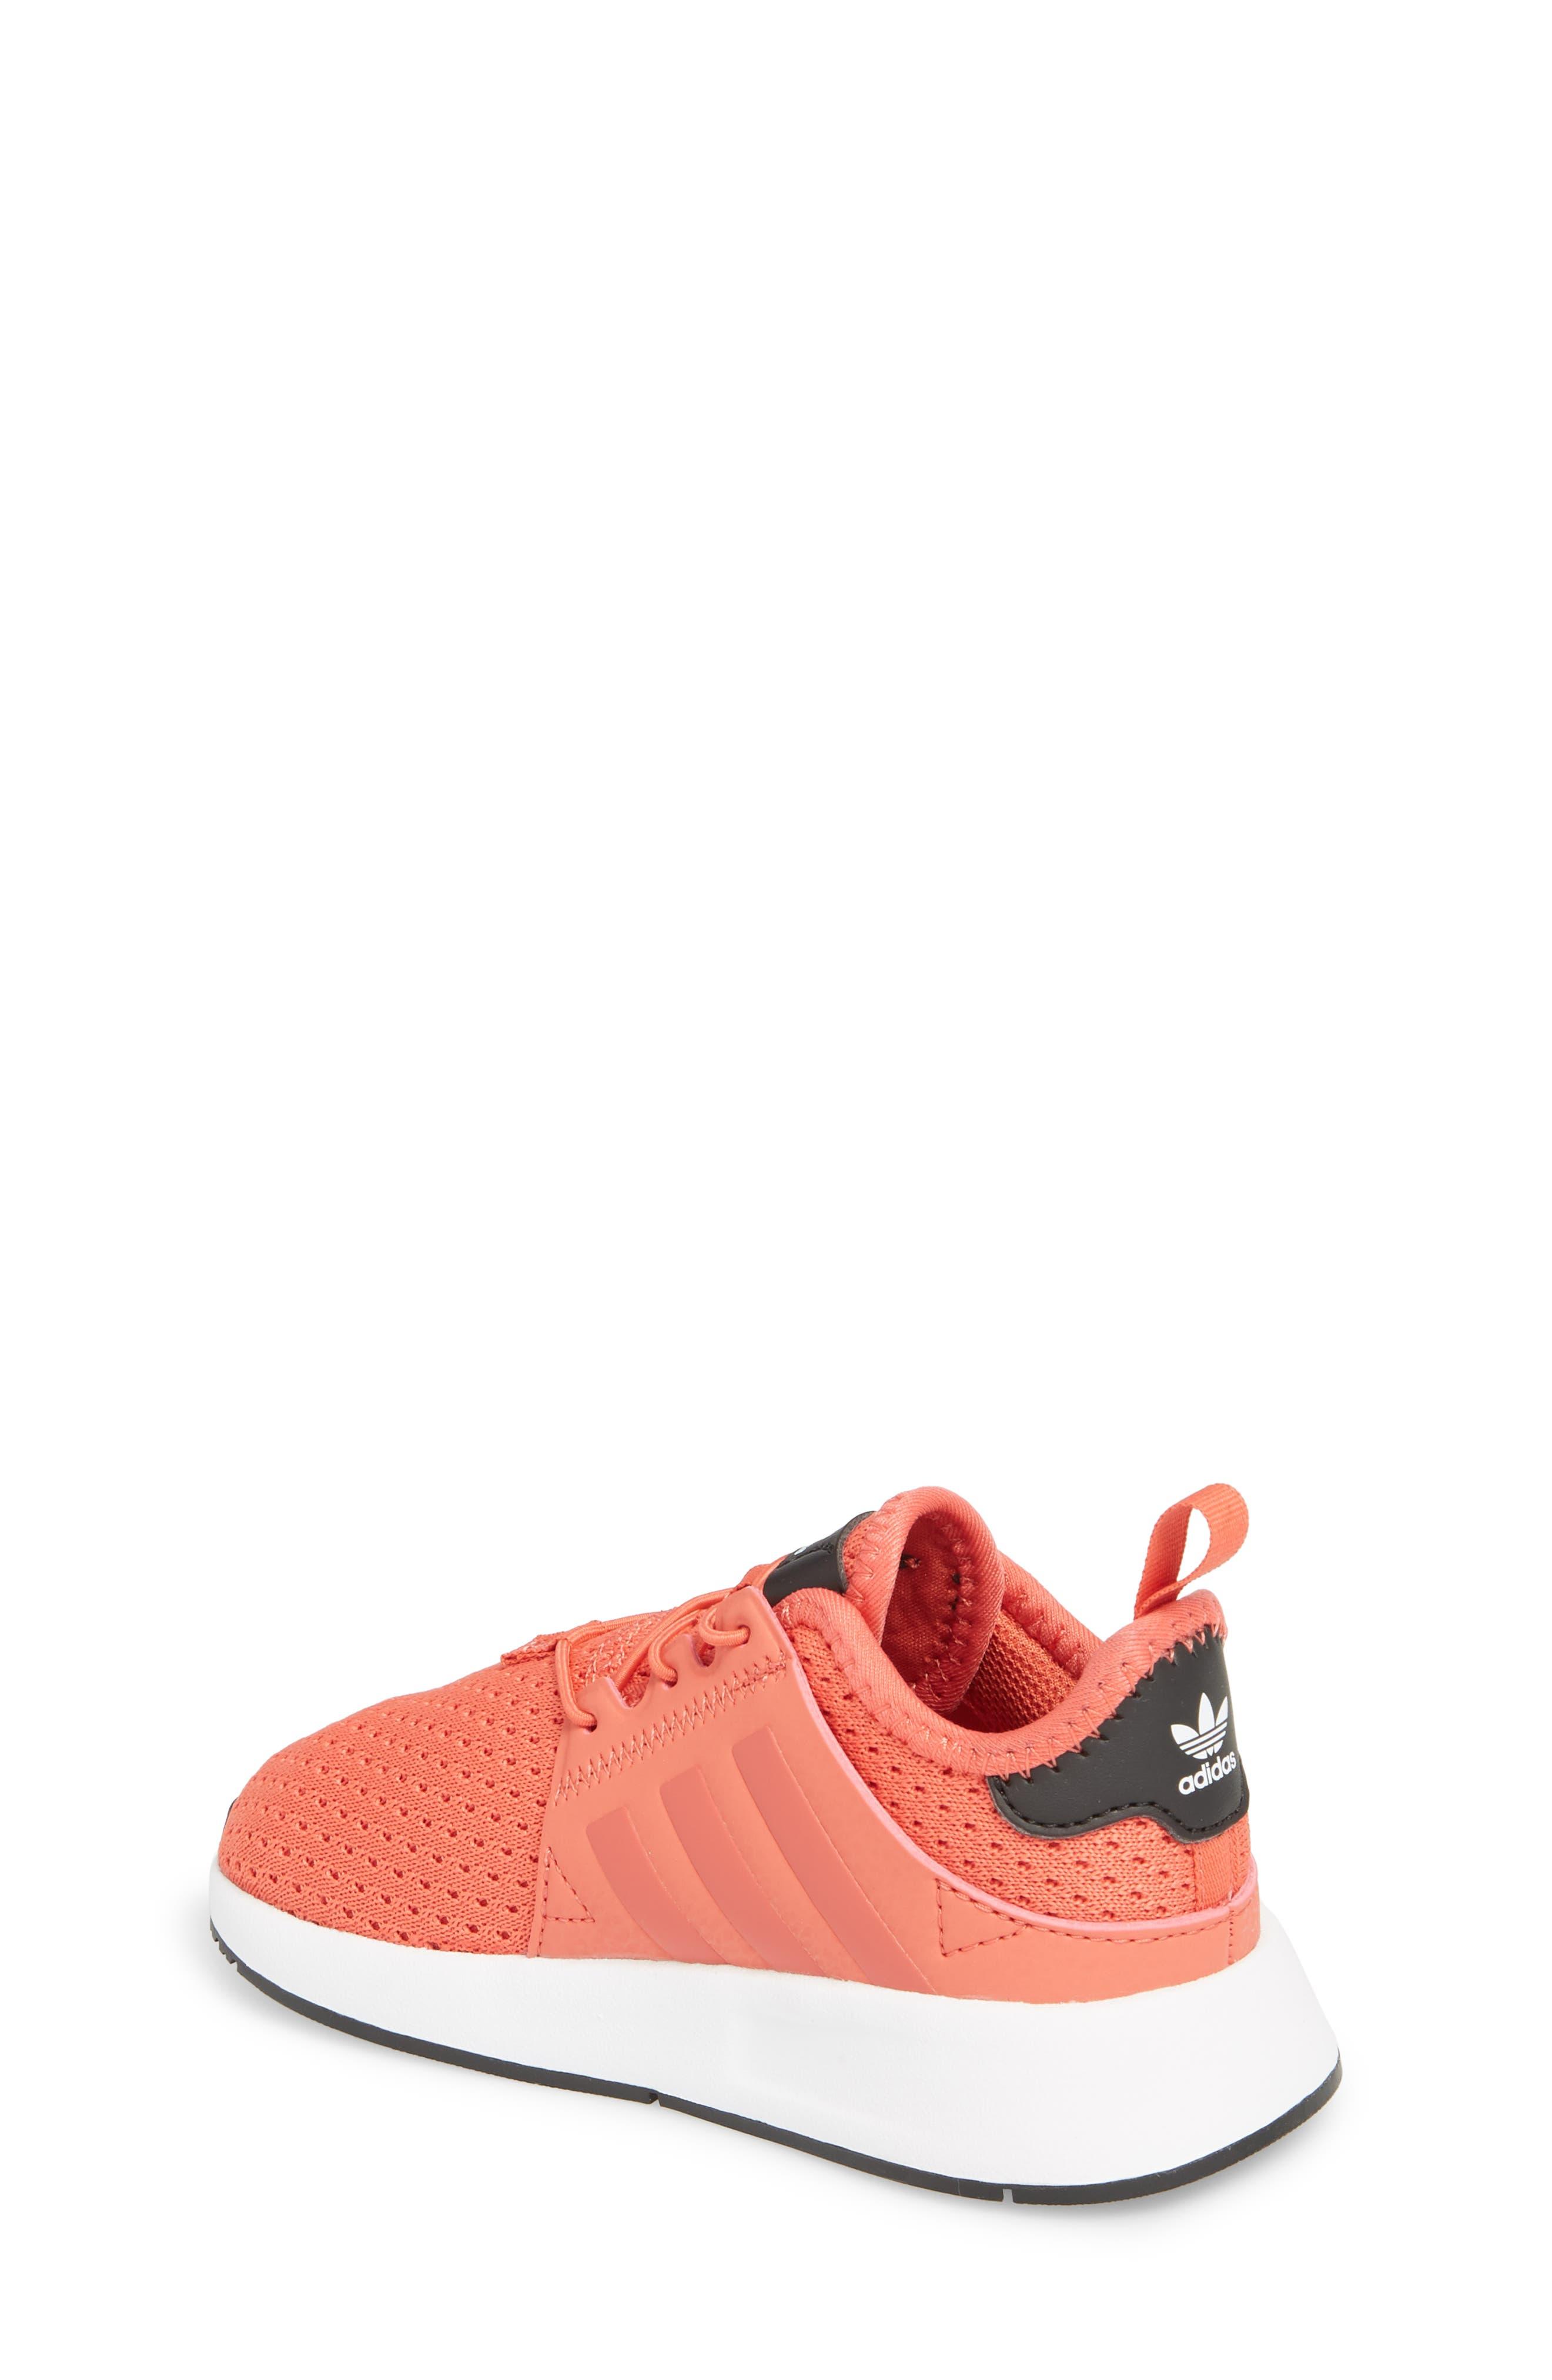 X_PLR Sneaker,                             Alternate thumbnail 2, color,                             Trace Scarlet/ White